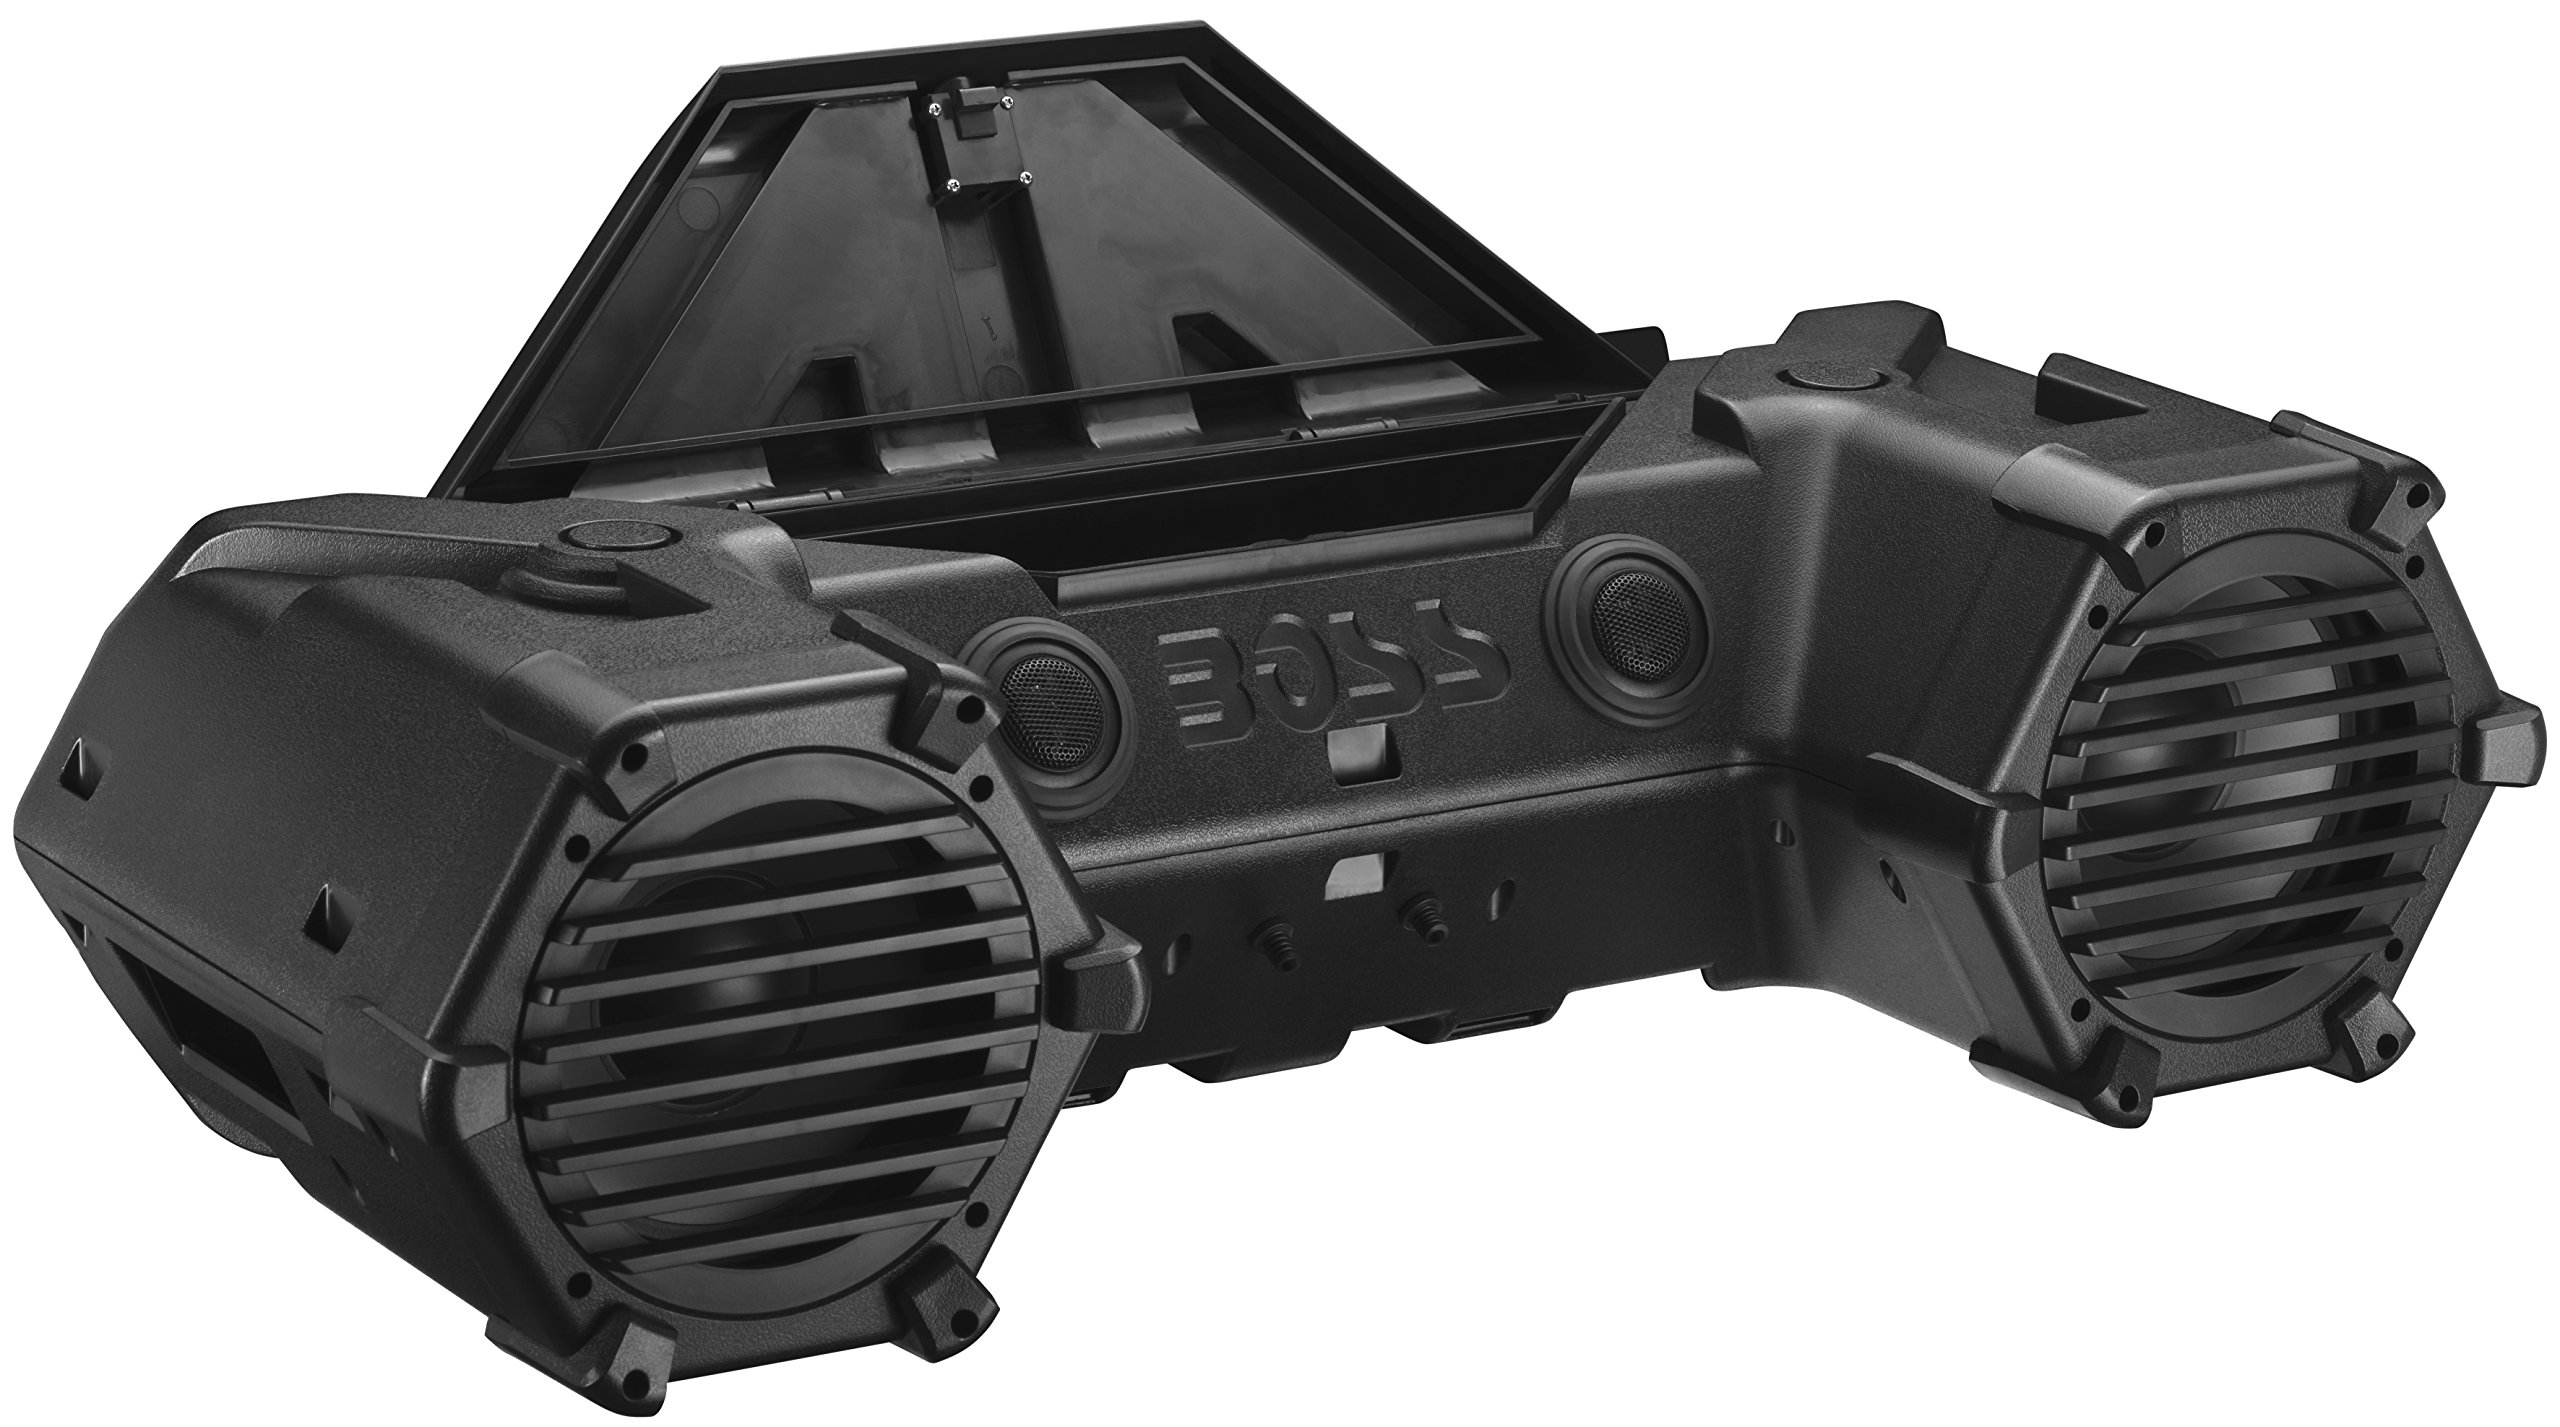 BOSS Audio ATVB90 Bluetooth, Amplified,  ATV/UTV Sound System, Weather-Proof Marine Grade, Bluetooth Remote, 12 Volt Application Friendly by BOSS Audio (Image #2)